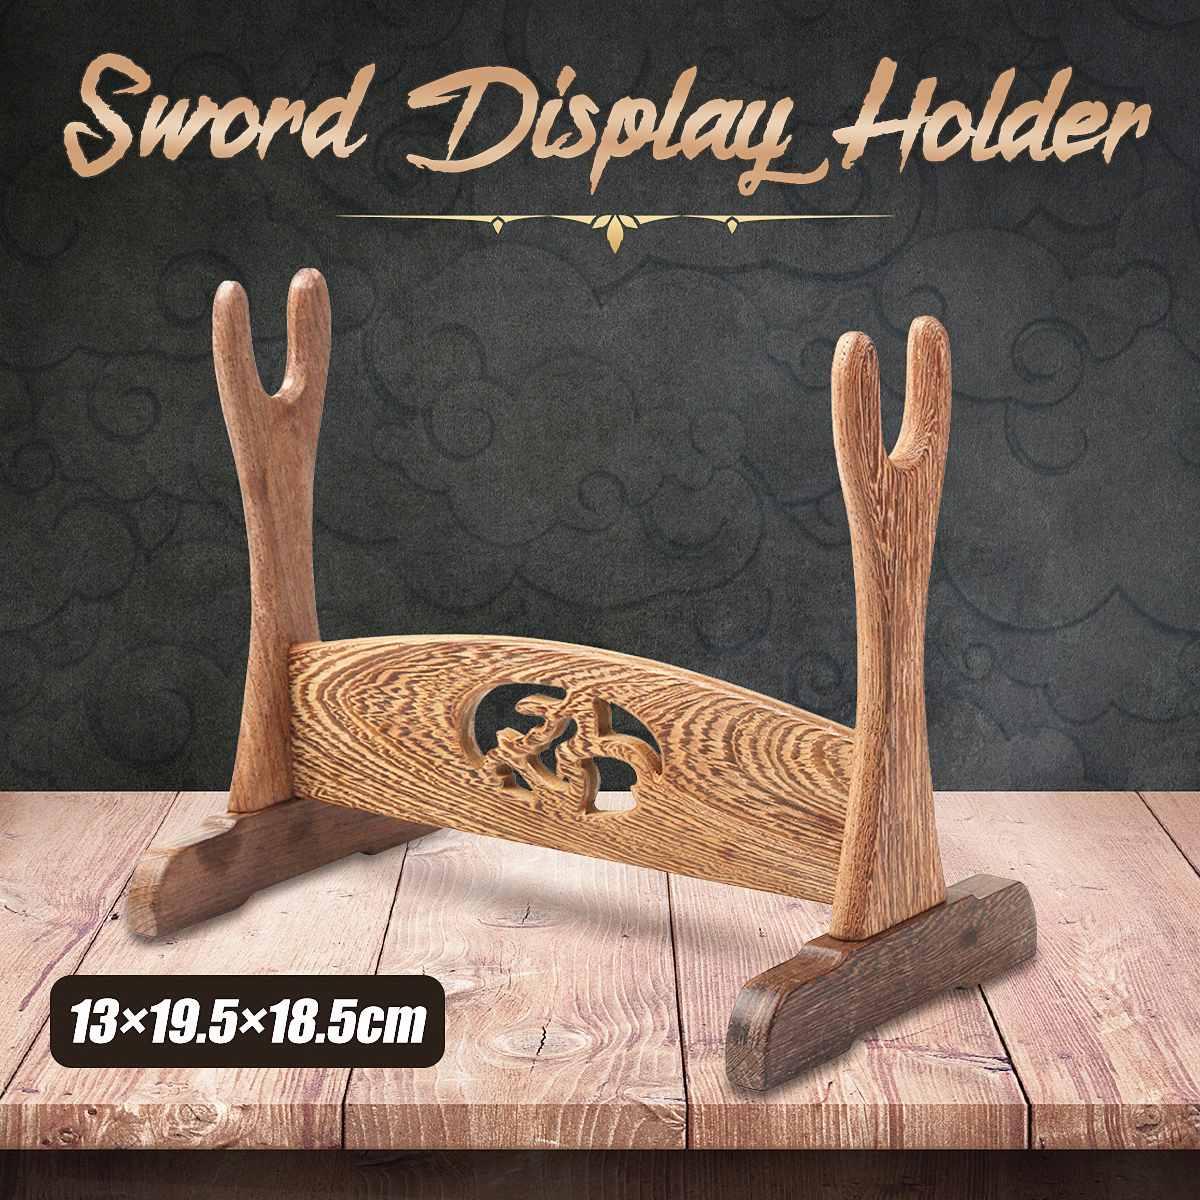 1pcs Japanese Samurai Sword Wenge Wood Wall Mounted Home Desk Decoration Stand Samurai Katana Holder Rack Holder Bracket Display